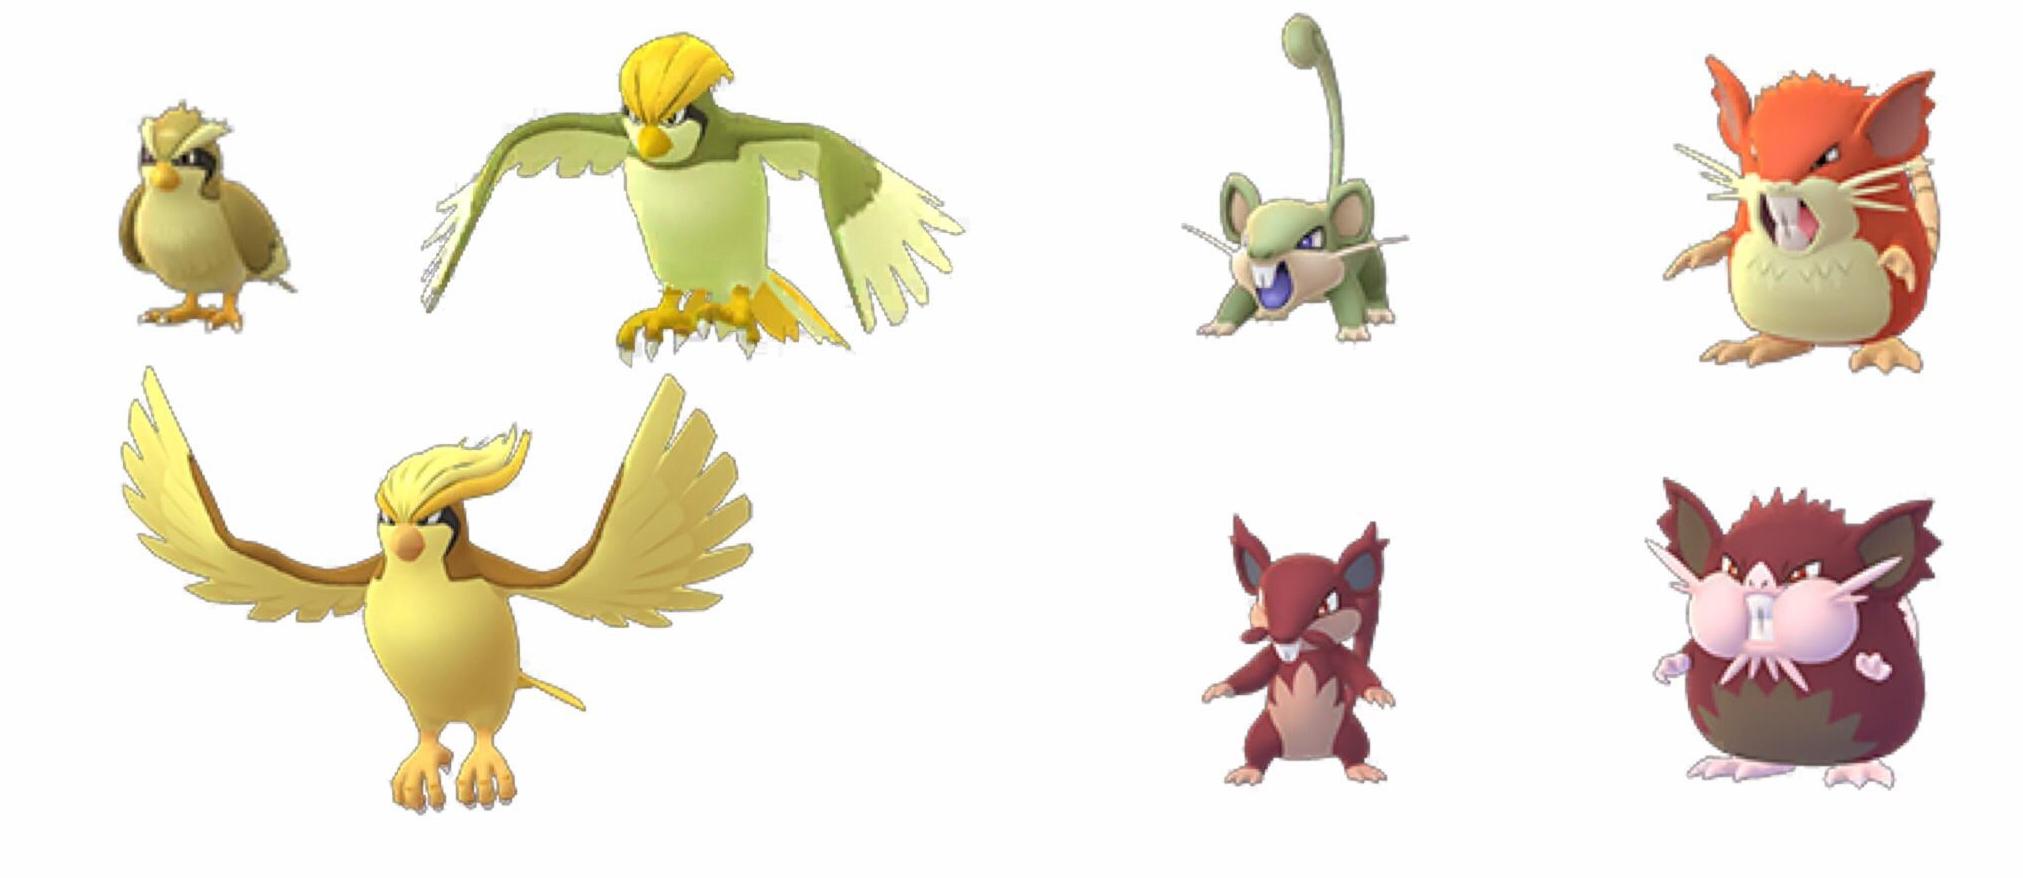 Celebrate Pokemon's 23rd Anniversary with a 'Pokemon Go